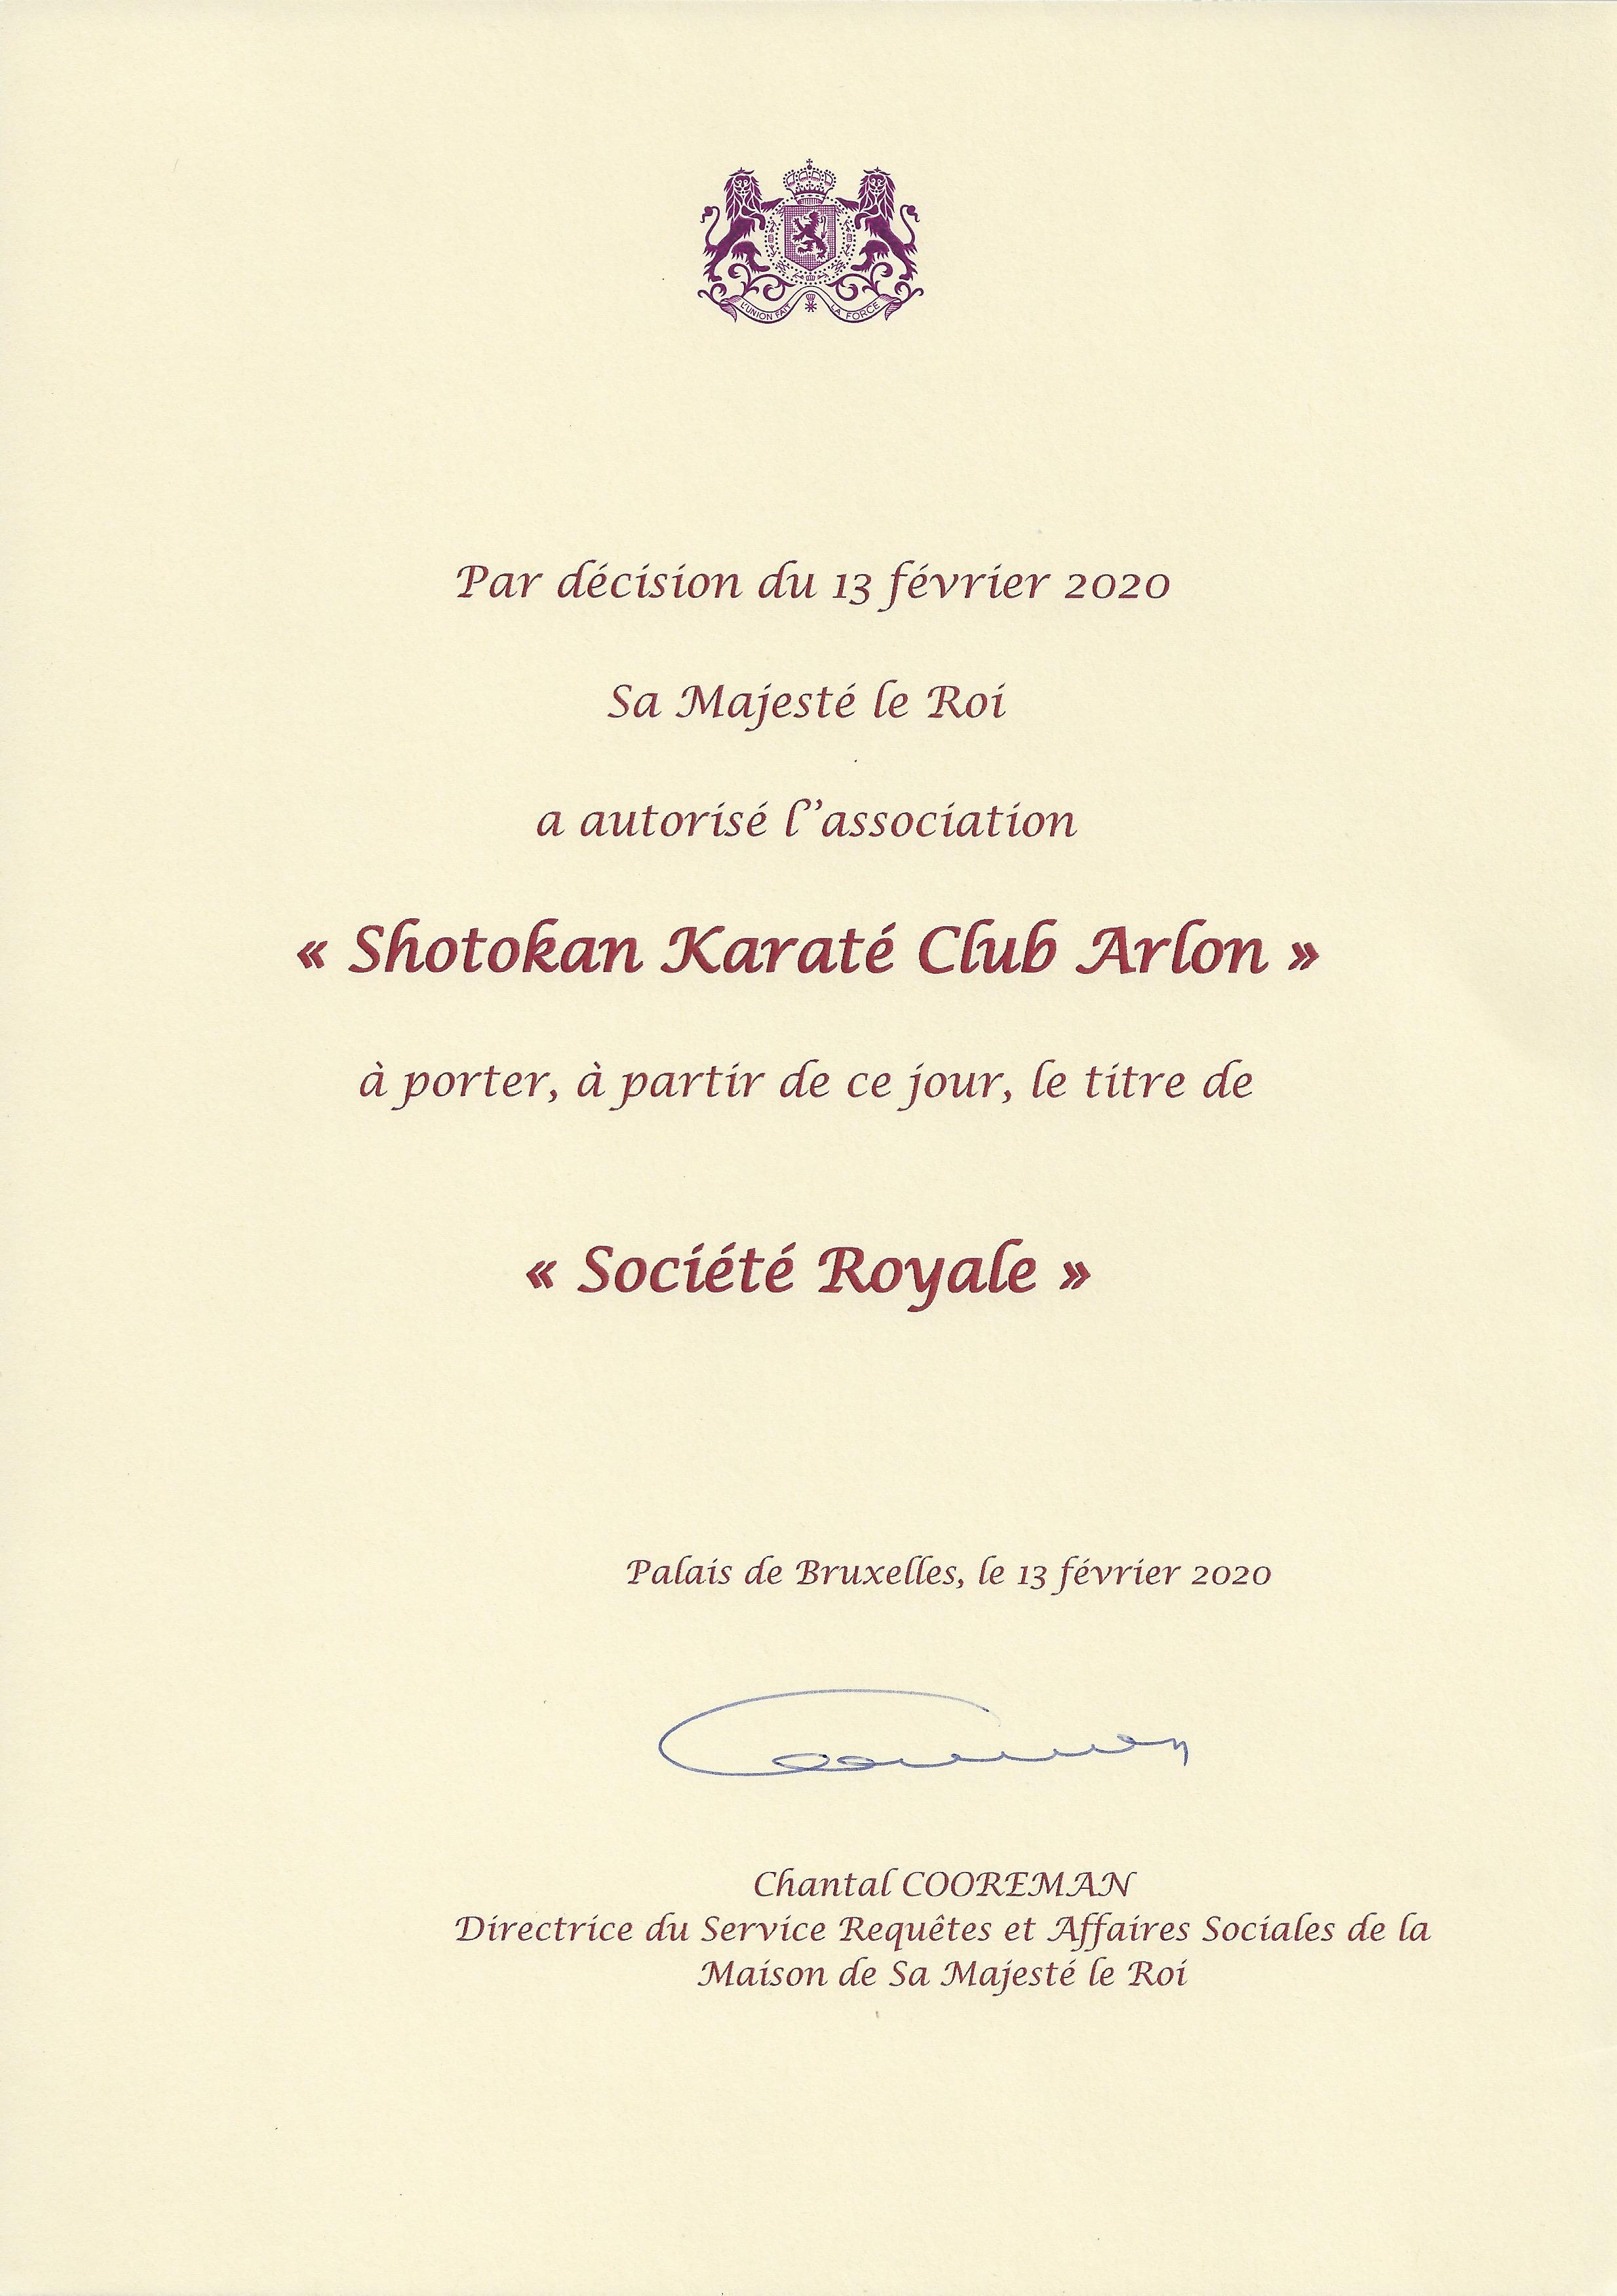 Royal-Shotokan-Karate-Club-Arlon_Titre